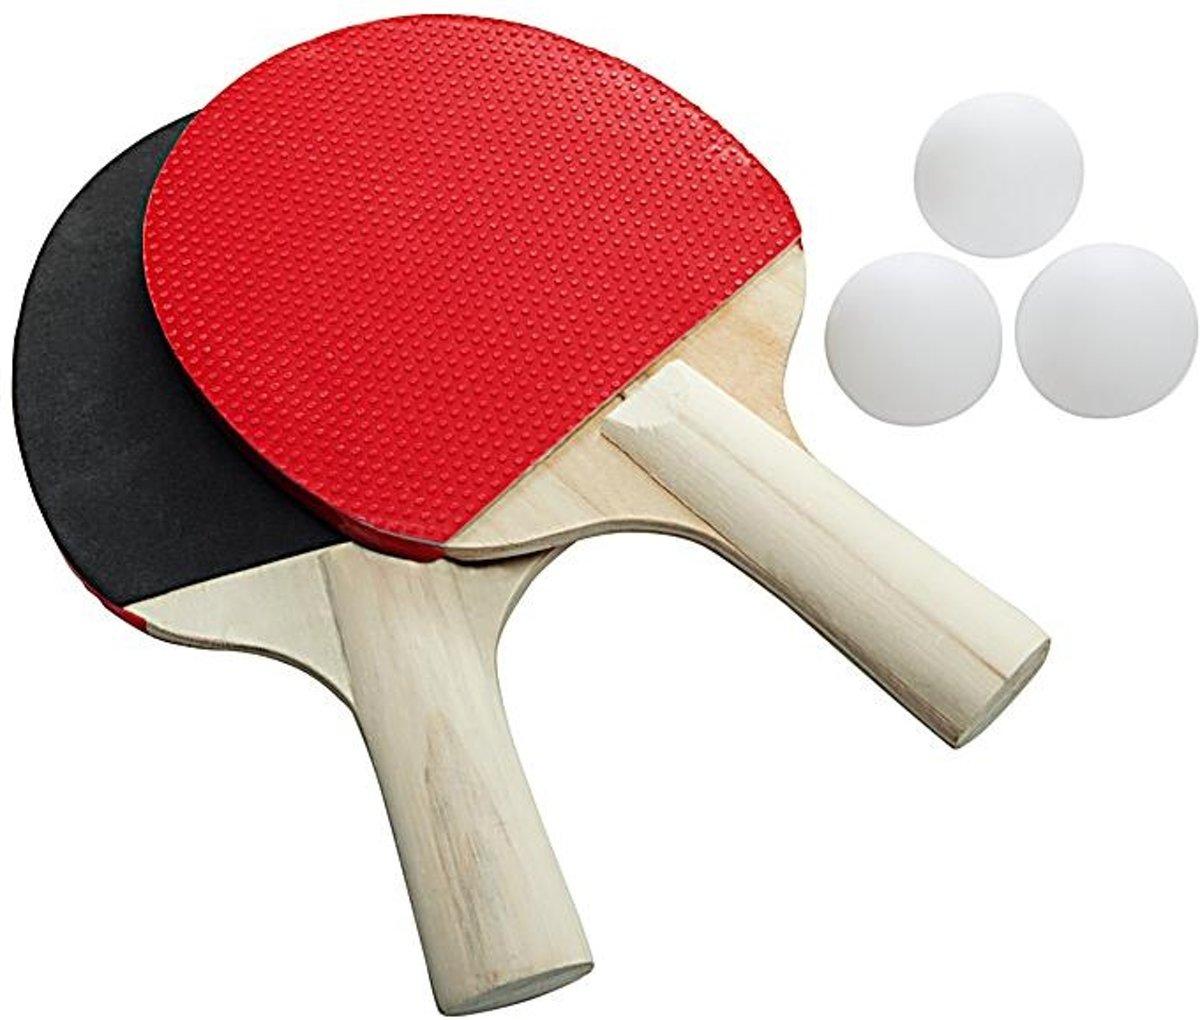 Playfun Tafeltennisset 5-delig Rood kopen